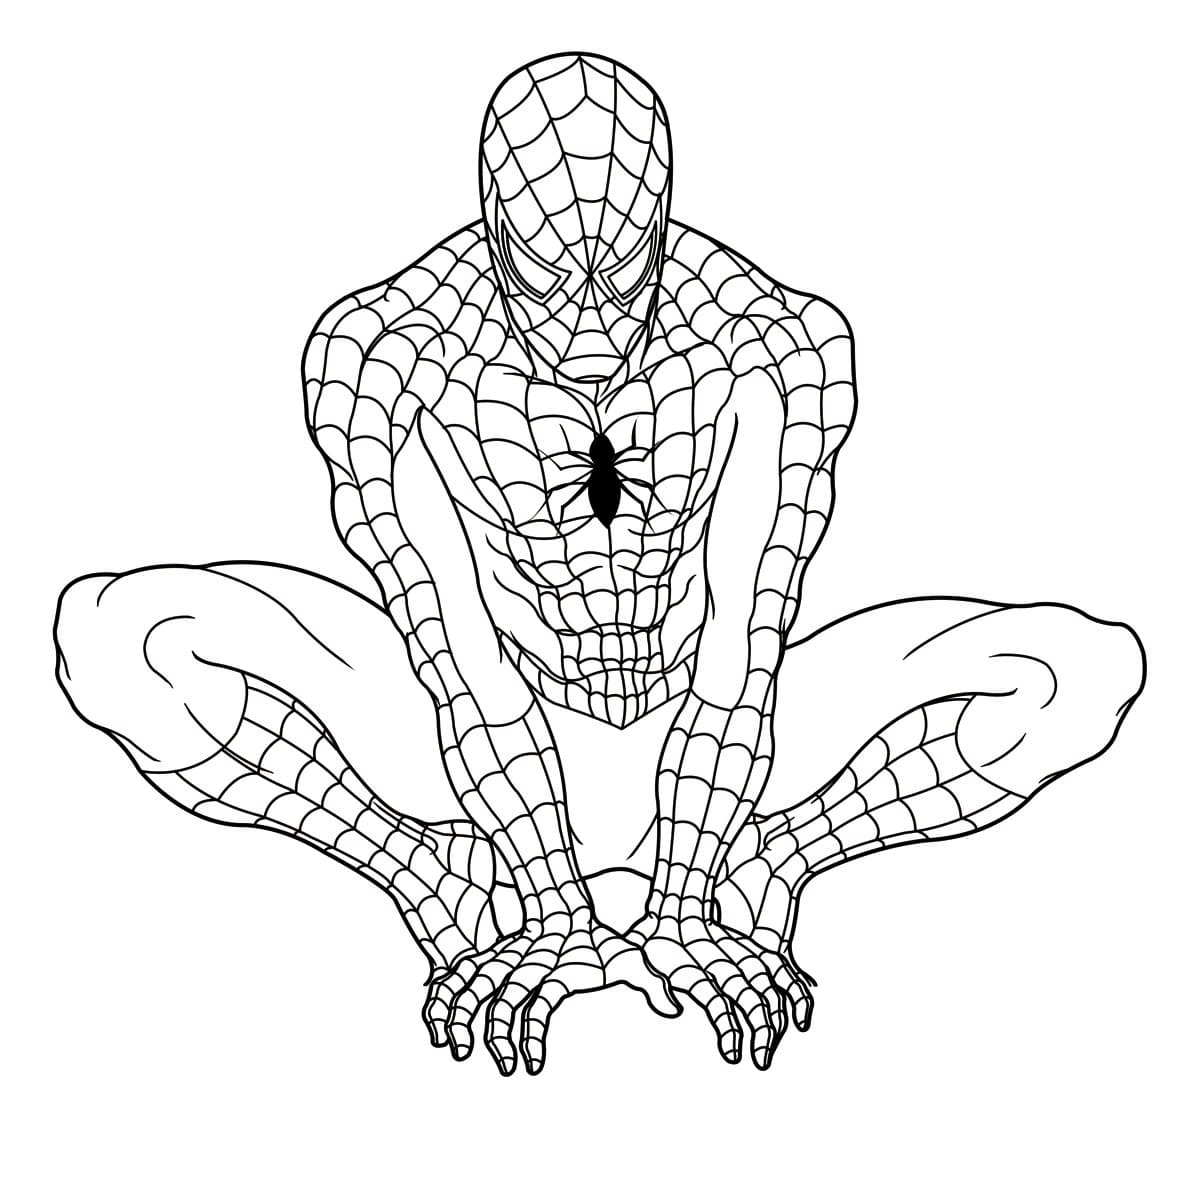 картинки разукрашки человека паука порода